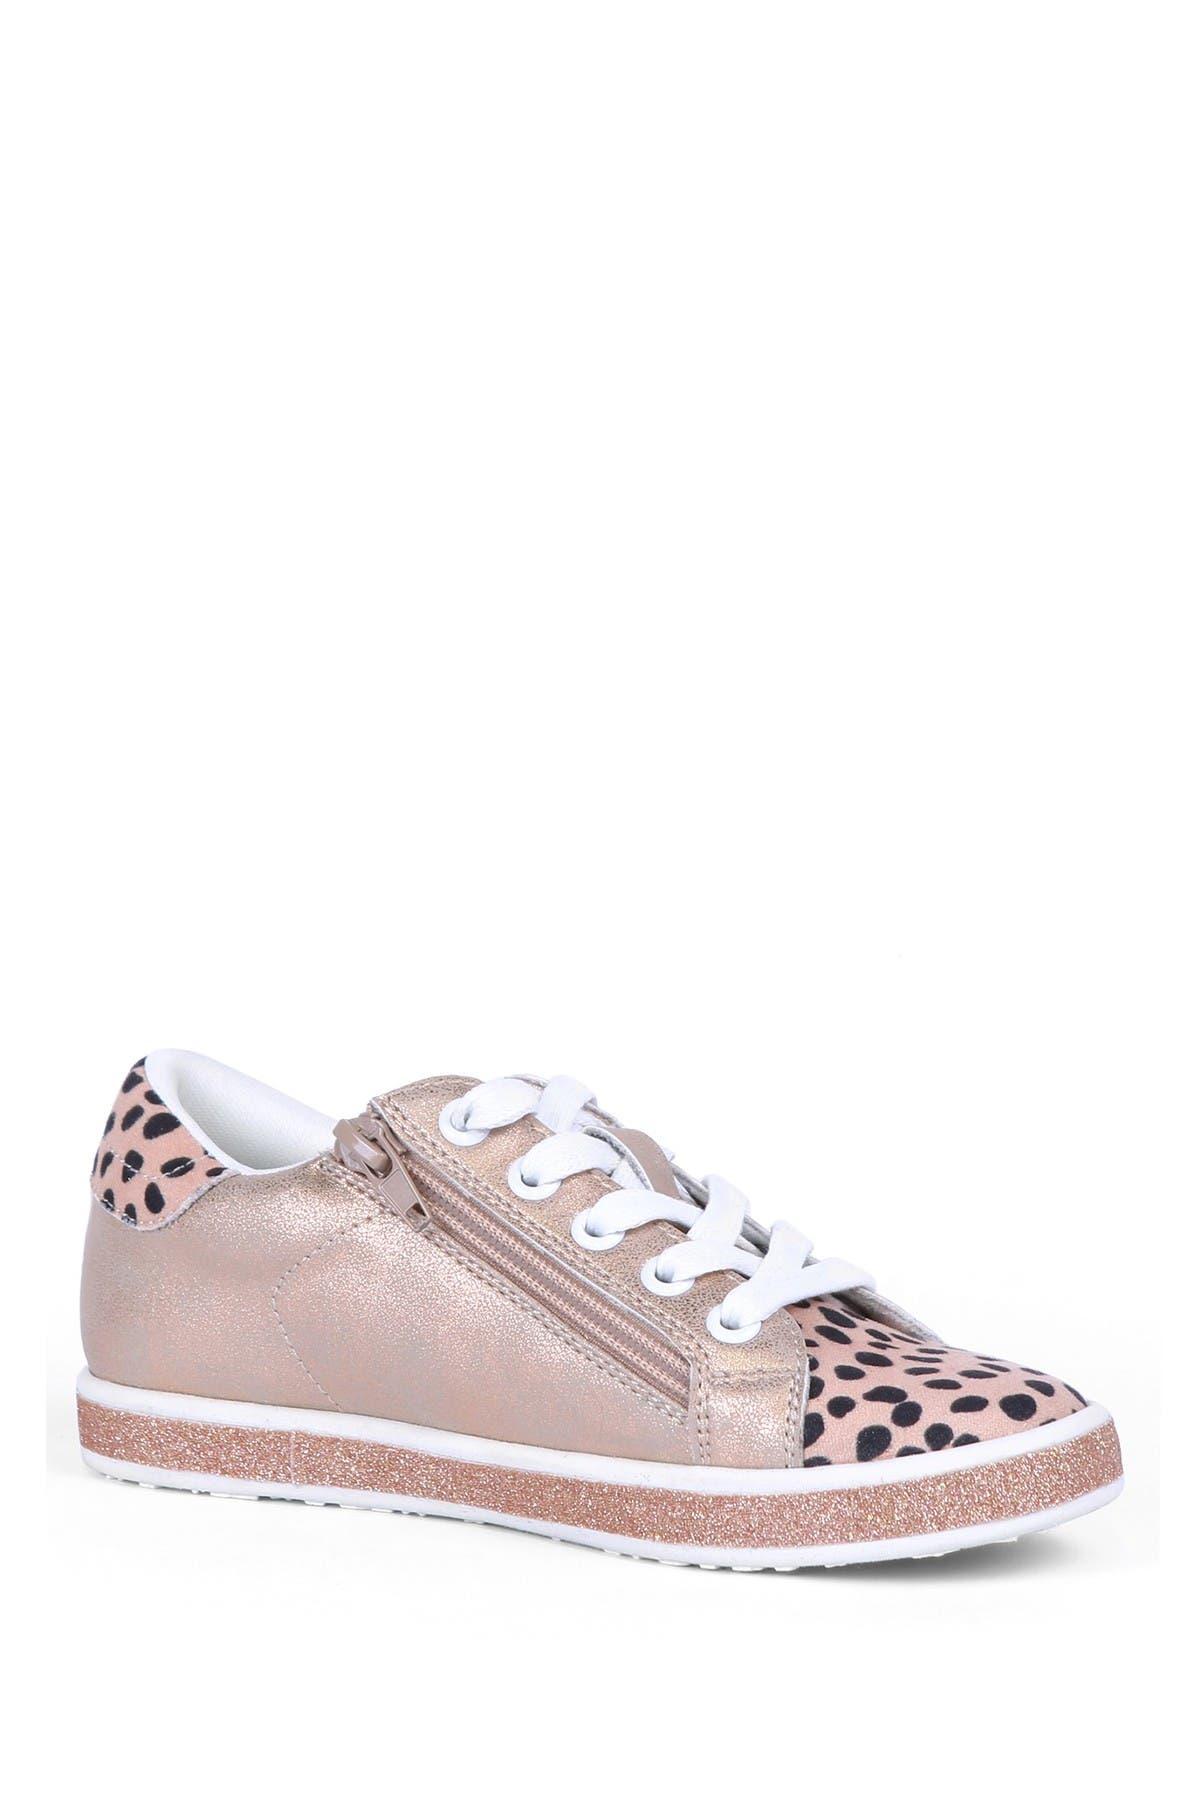 Image of DV DOLCE VITA Low Top Zip Sneaker